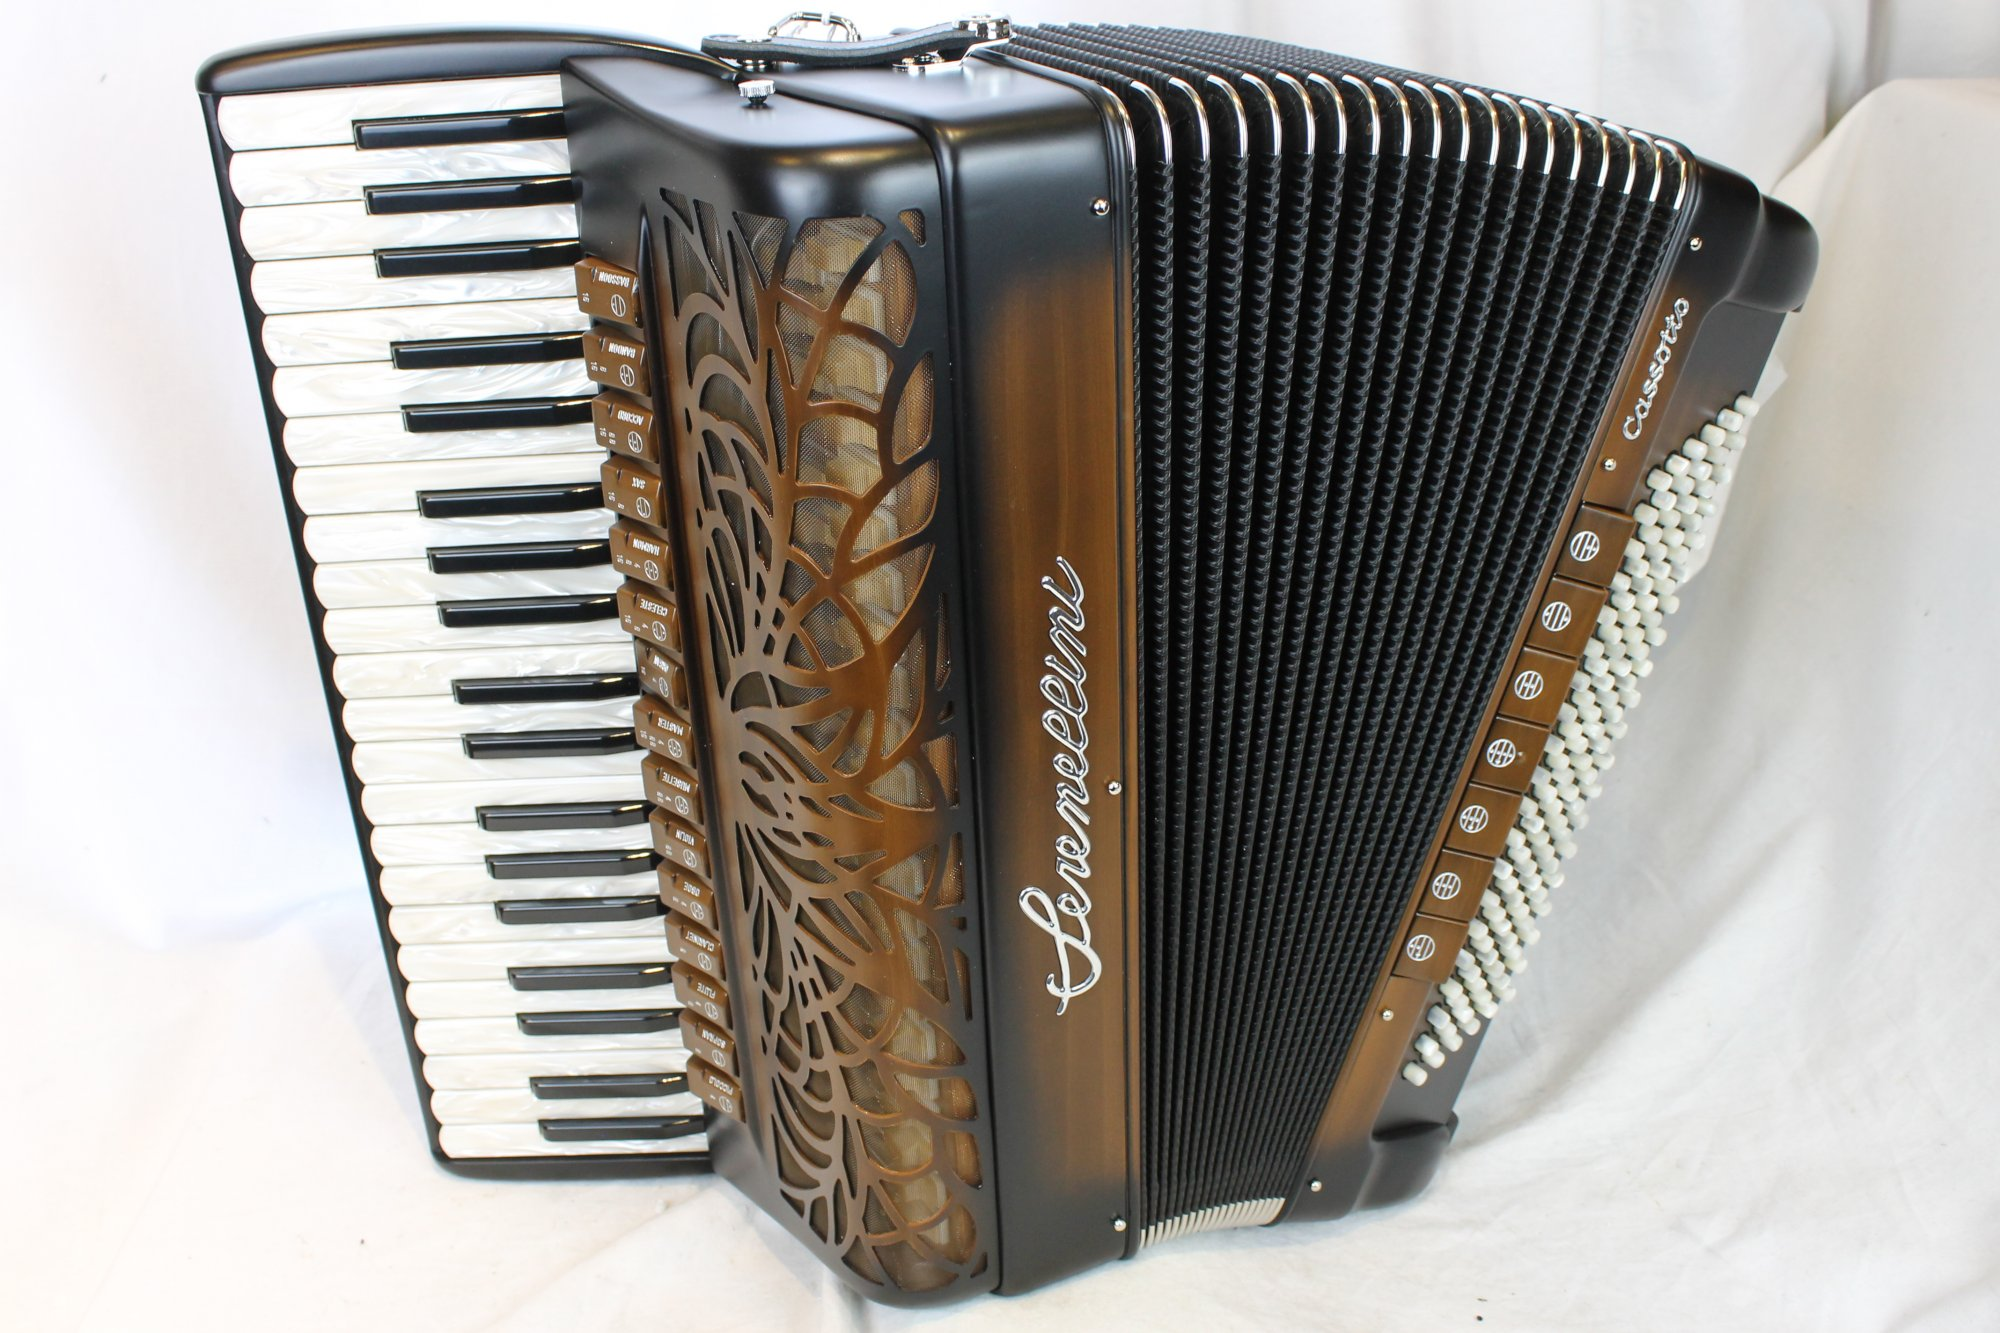 NEW Chocolate Serenellini Zeus Piano Accordion LMMH 41 120